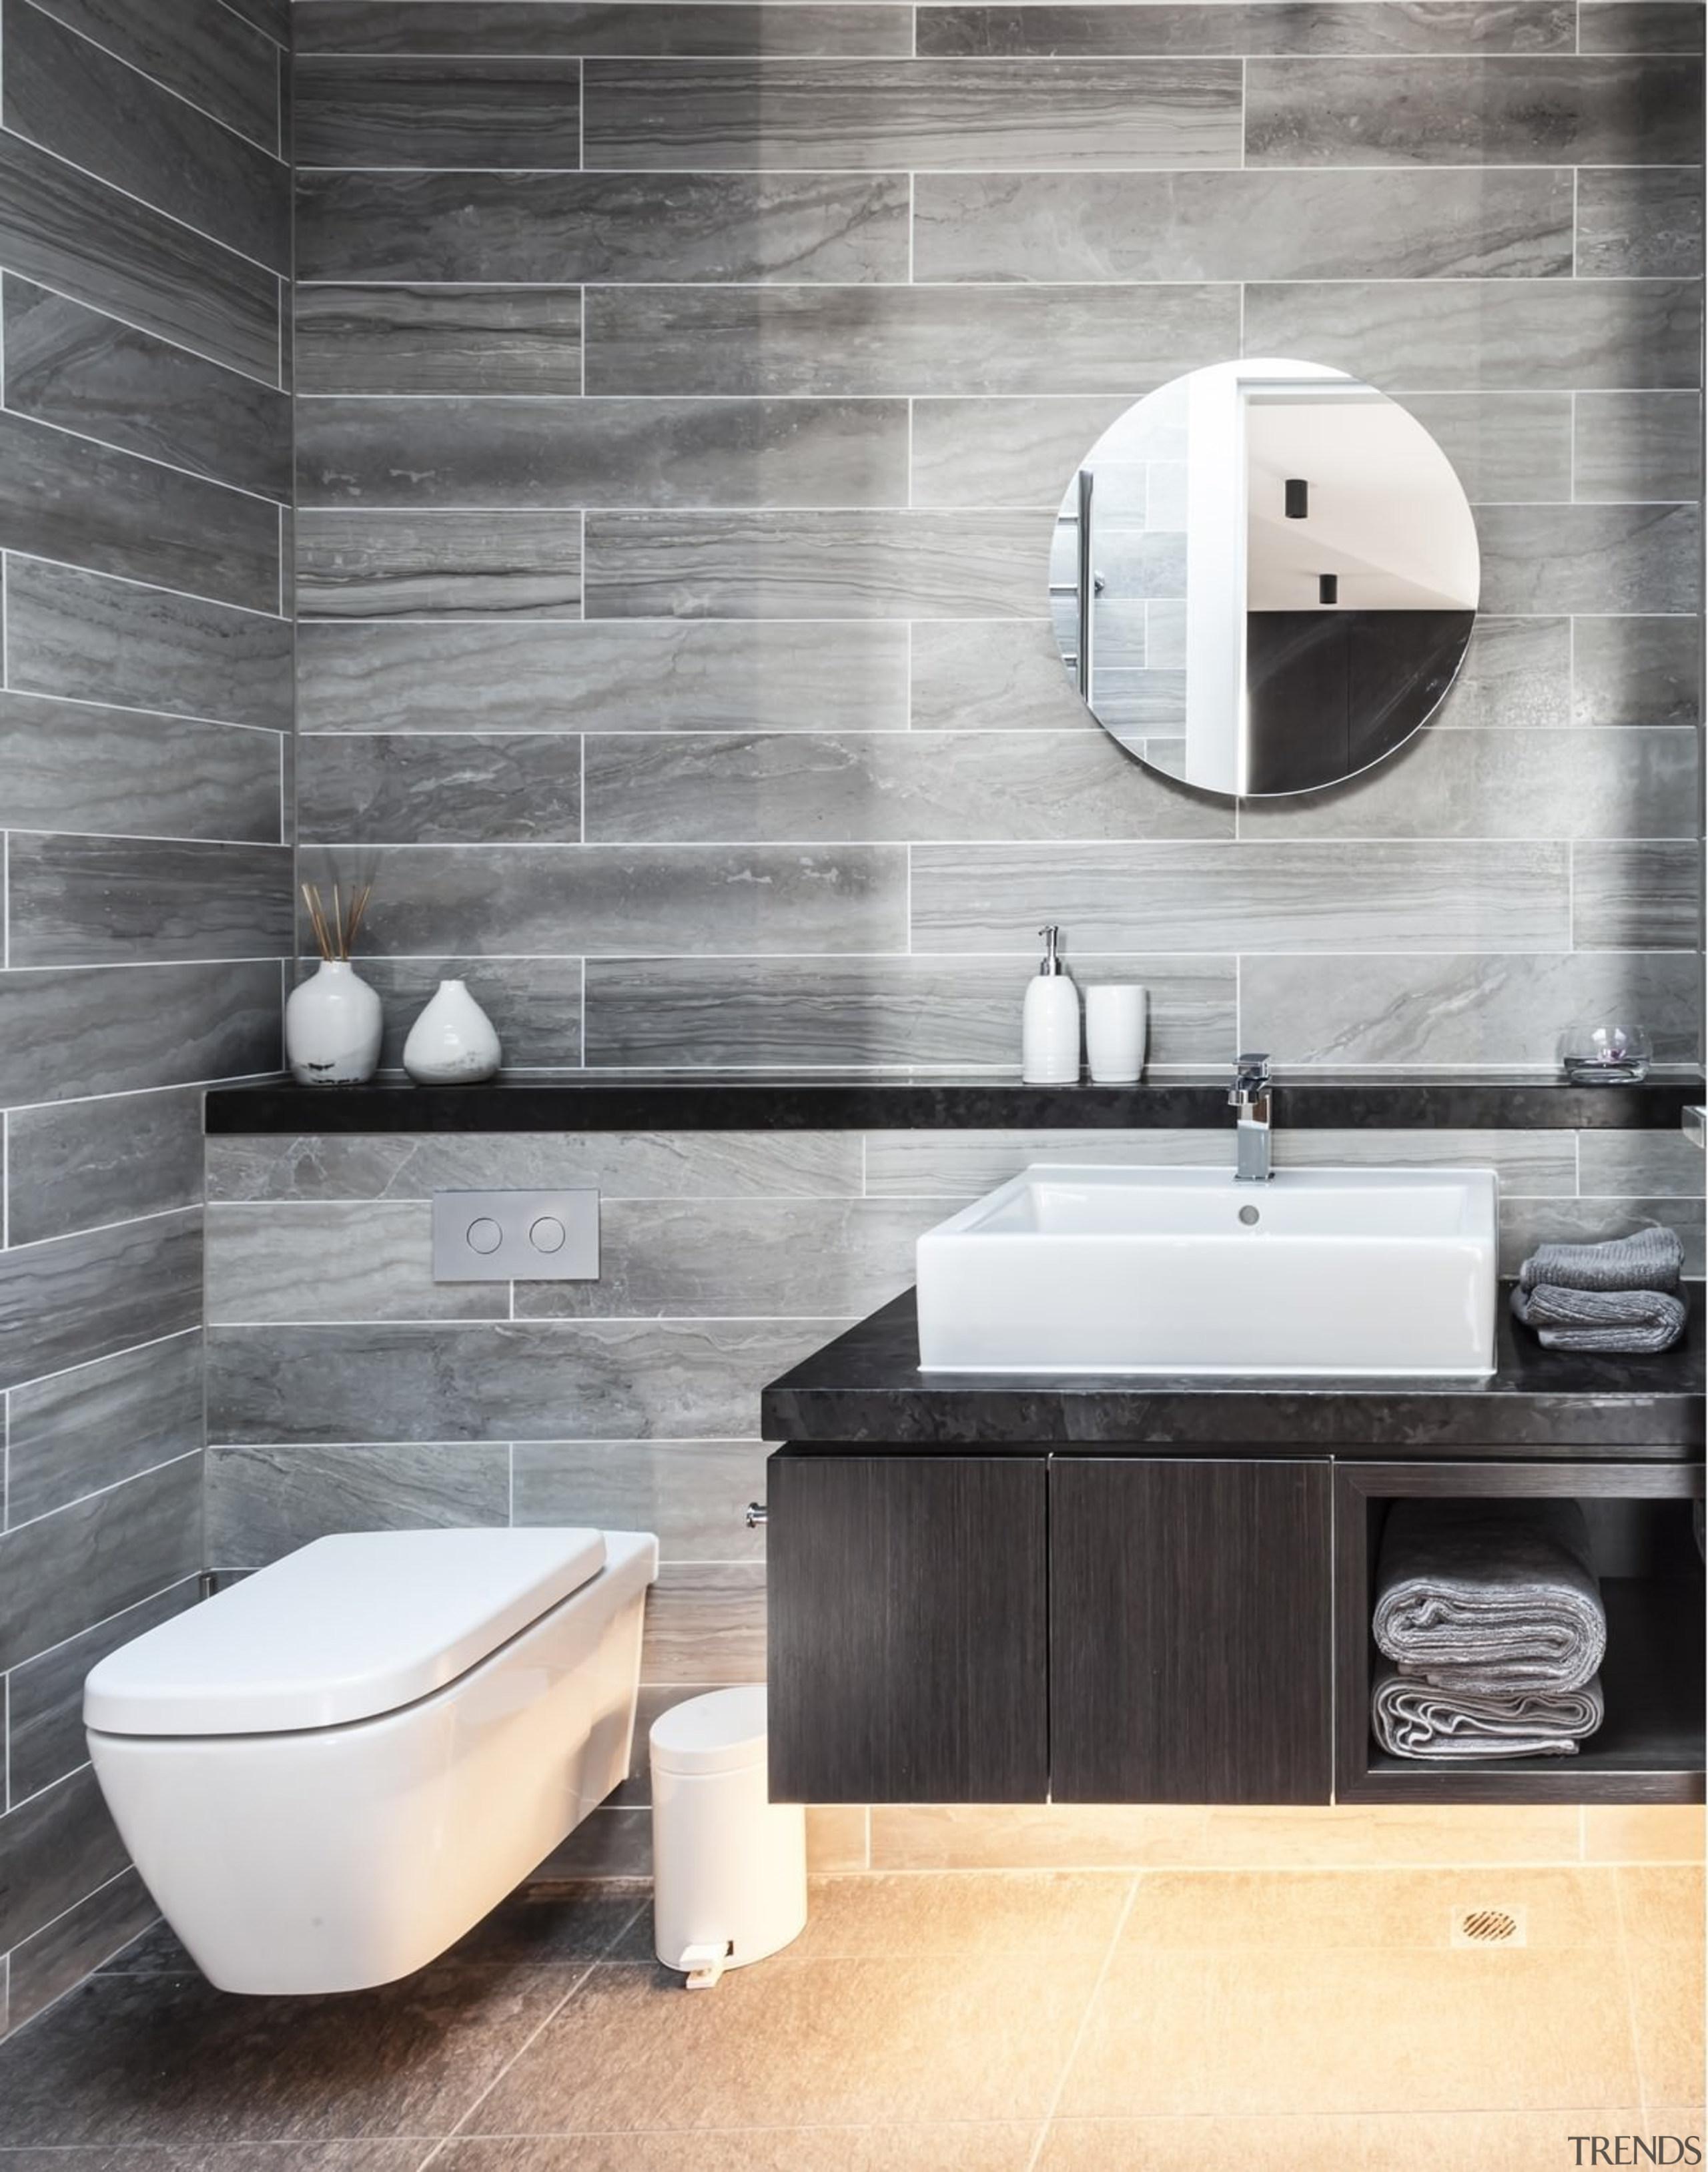 Architect: mcmahon and nerlich architectsPhotography by superk bathroom, bathroom accessory, bathroom sink, bidet, ceramic, floor, flooring, interior design, plumbing fixture, product design, sink, tap, tile, toilet seat, wall, gray, white